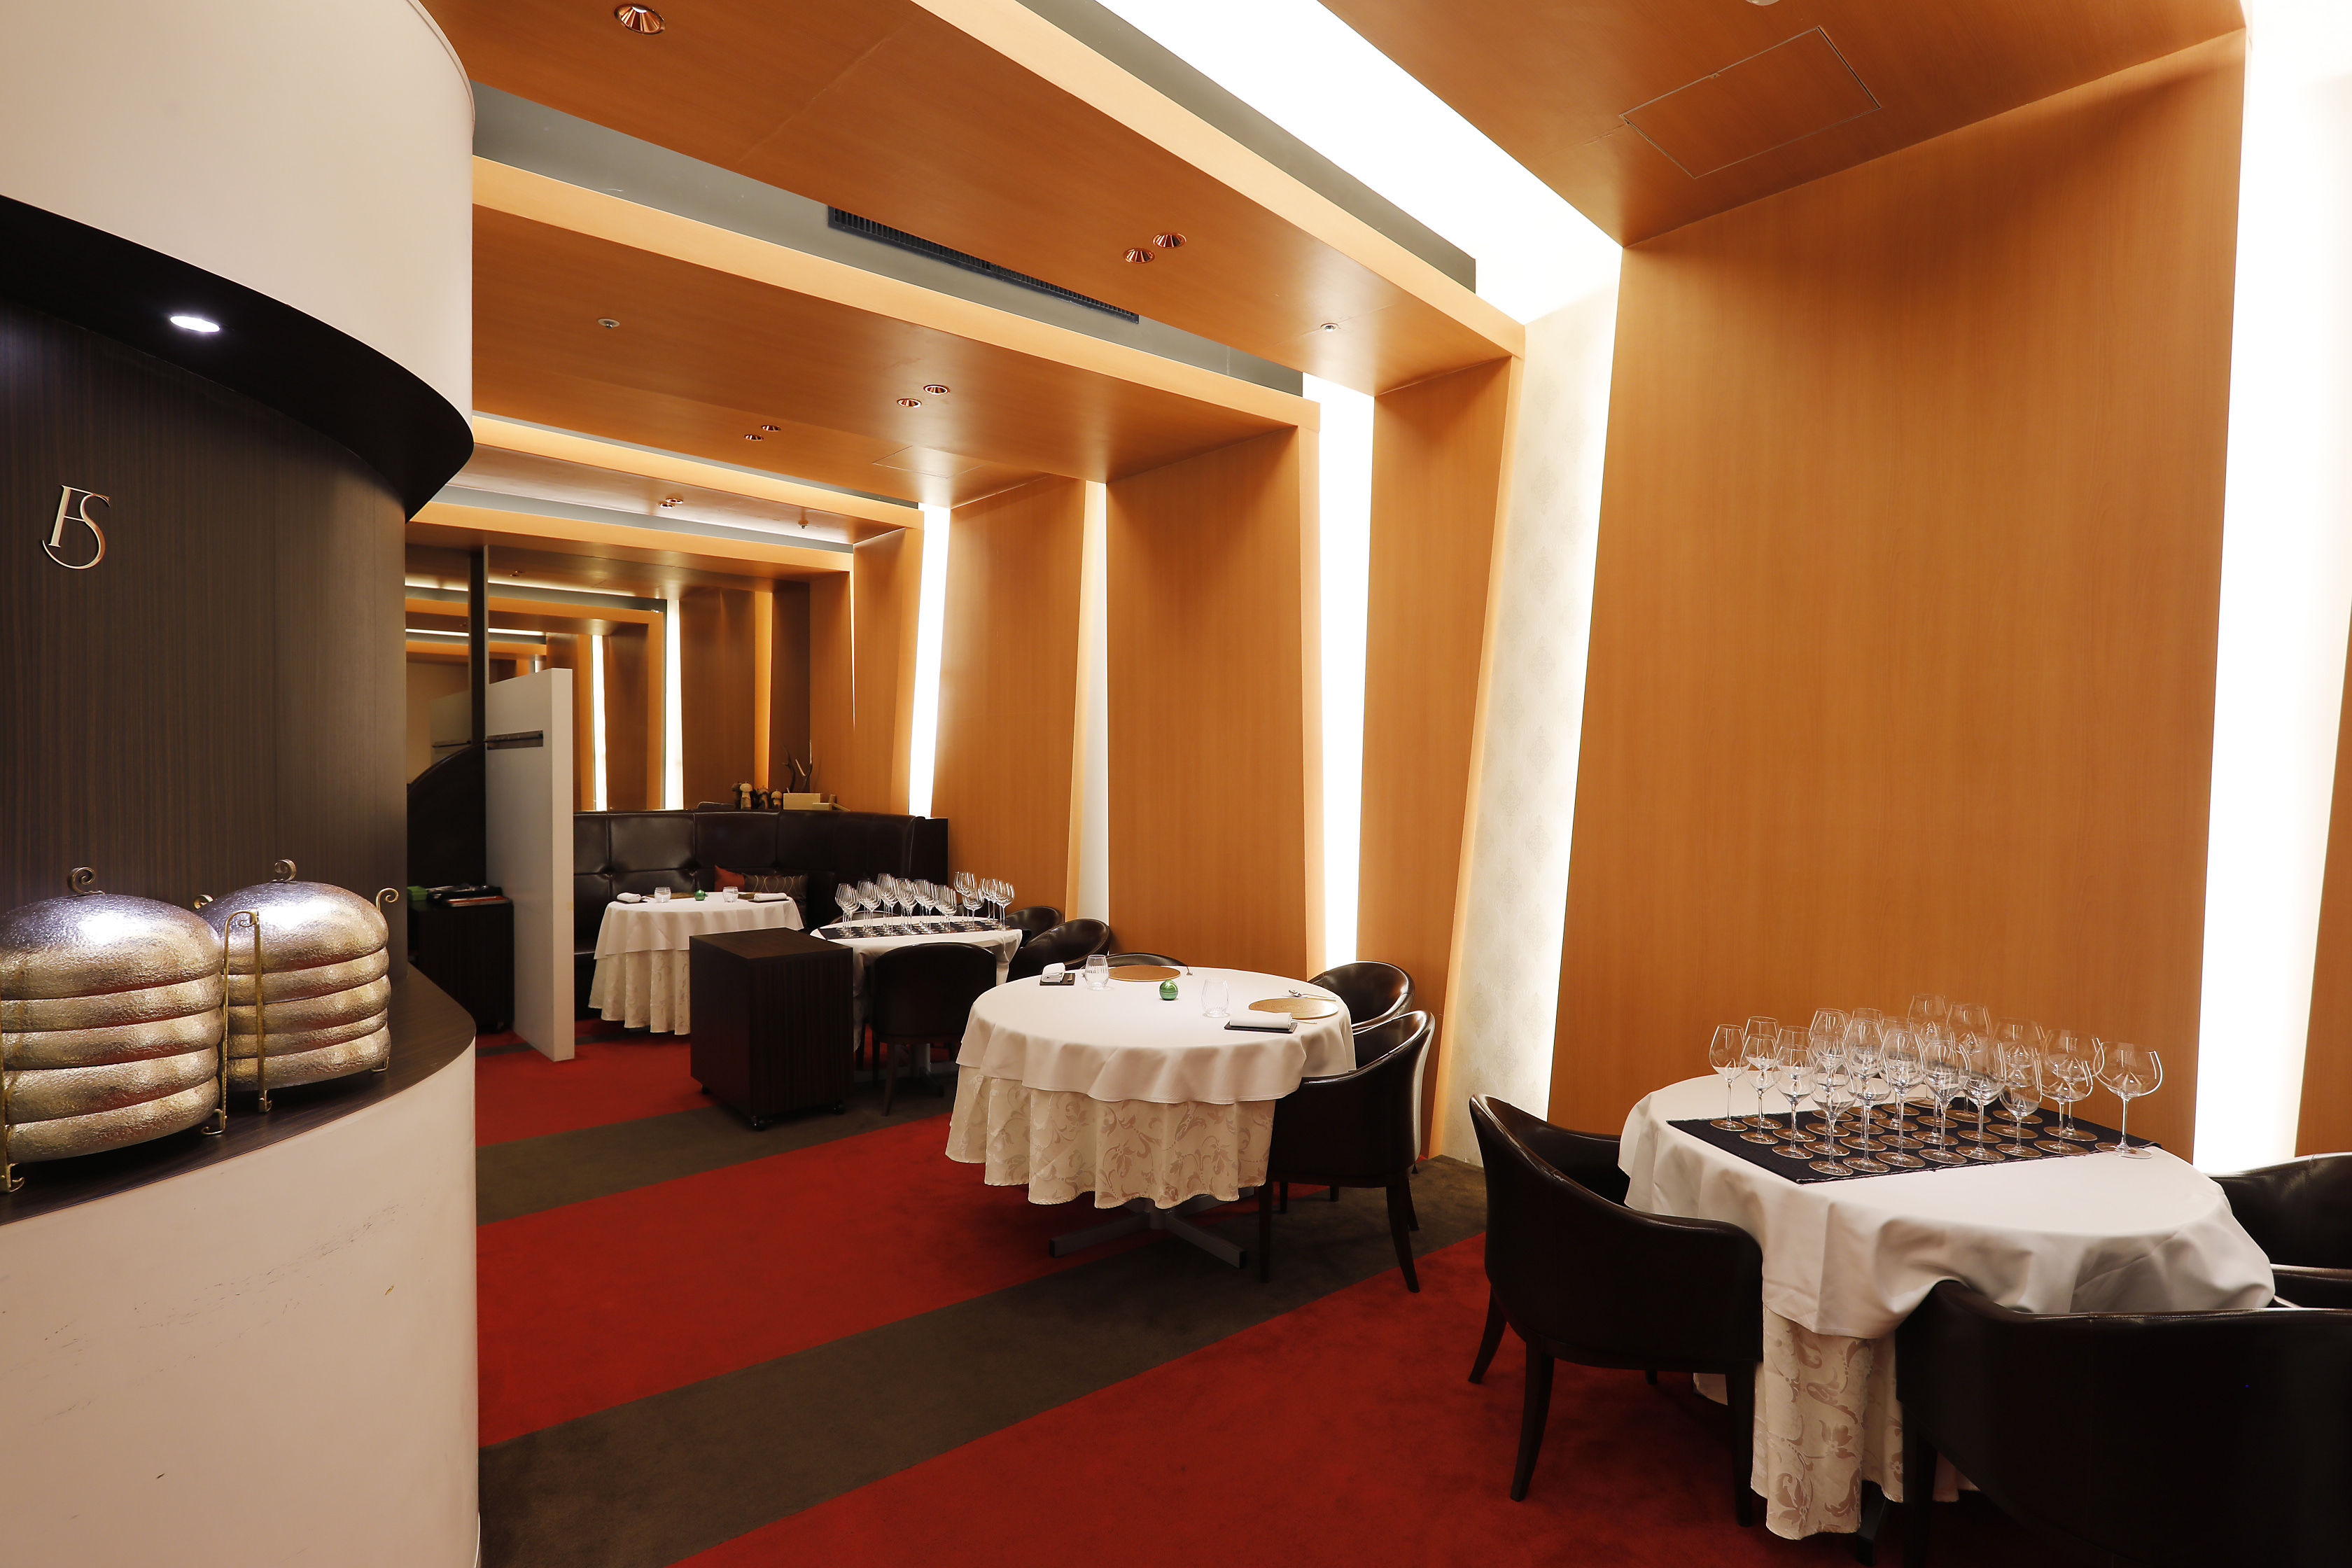 Restaurant La FinS(レストラン ラ フィネス)内観